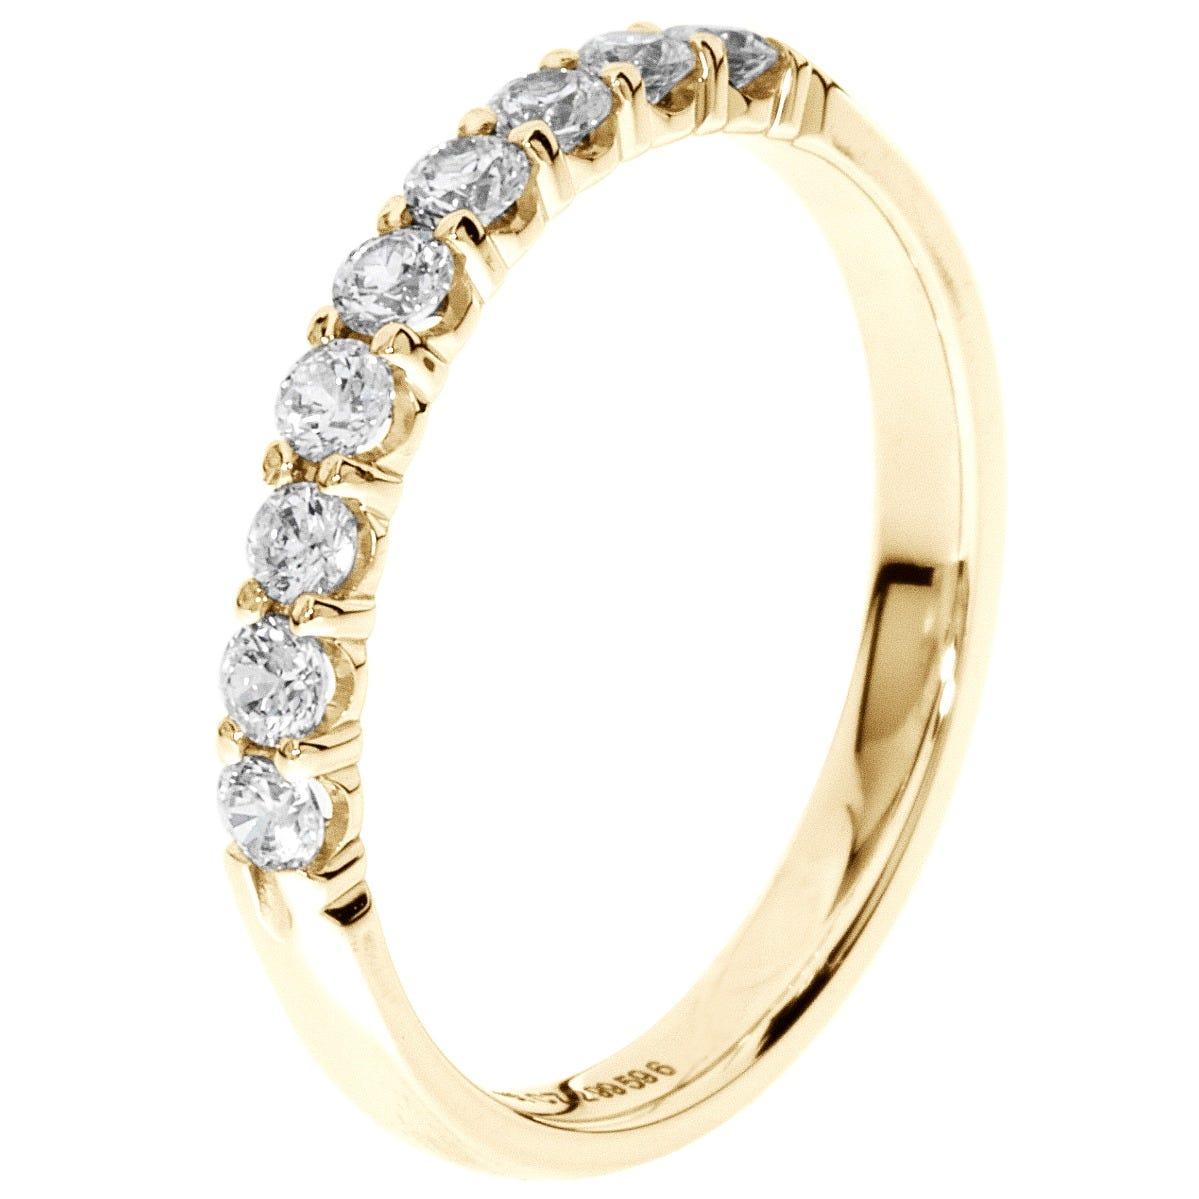 9-Stone Diamond Band 1/3 ctw. (G-H, SI2) 14k Yellow Gold